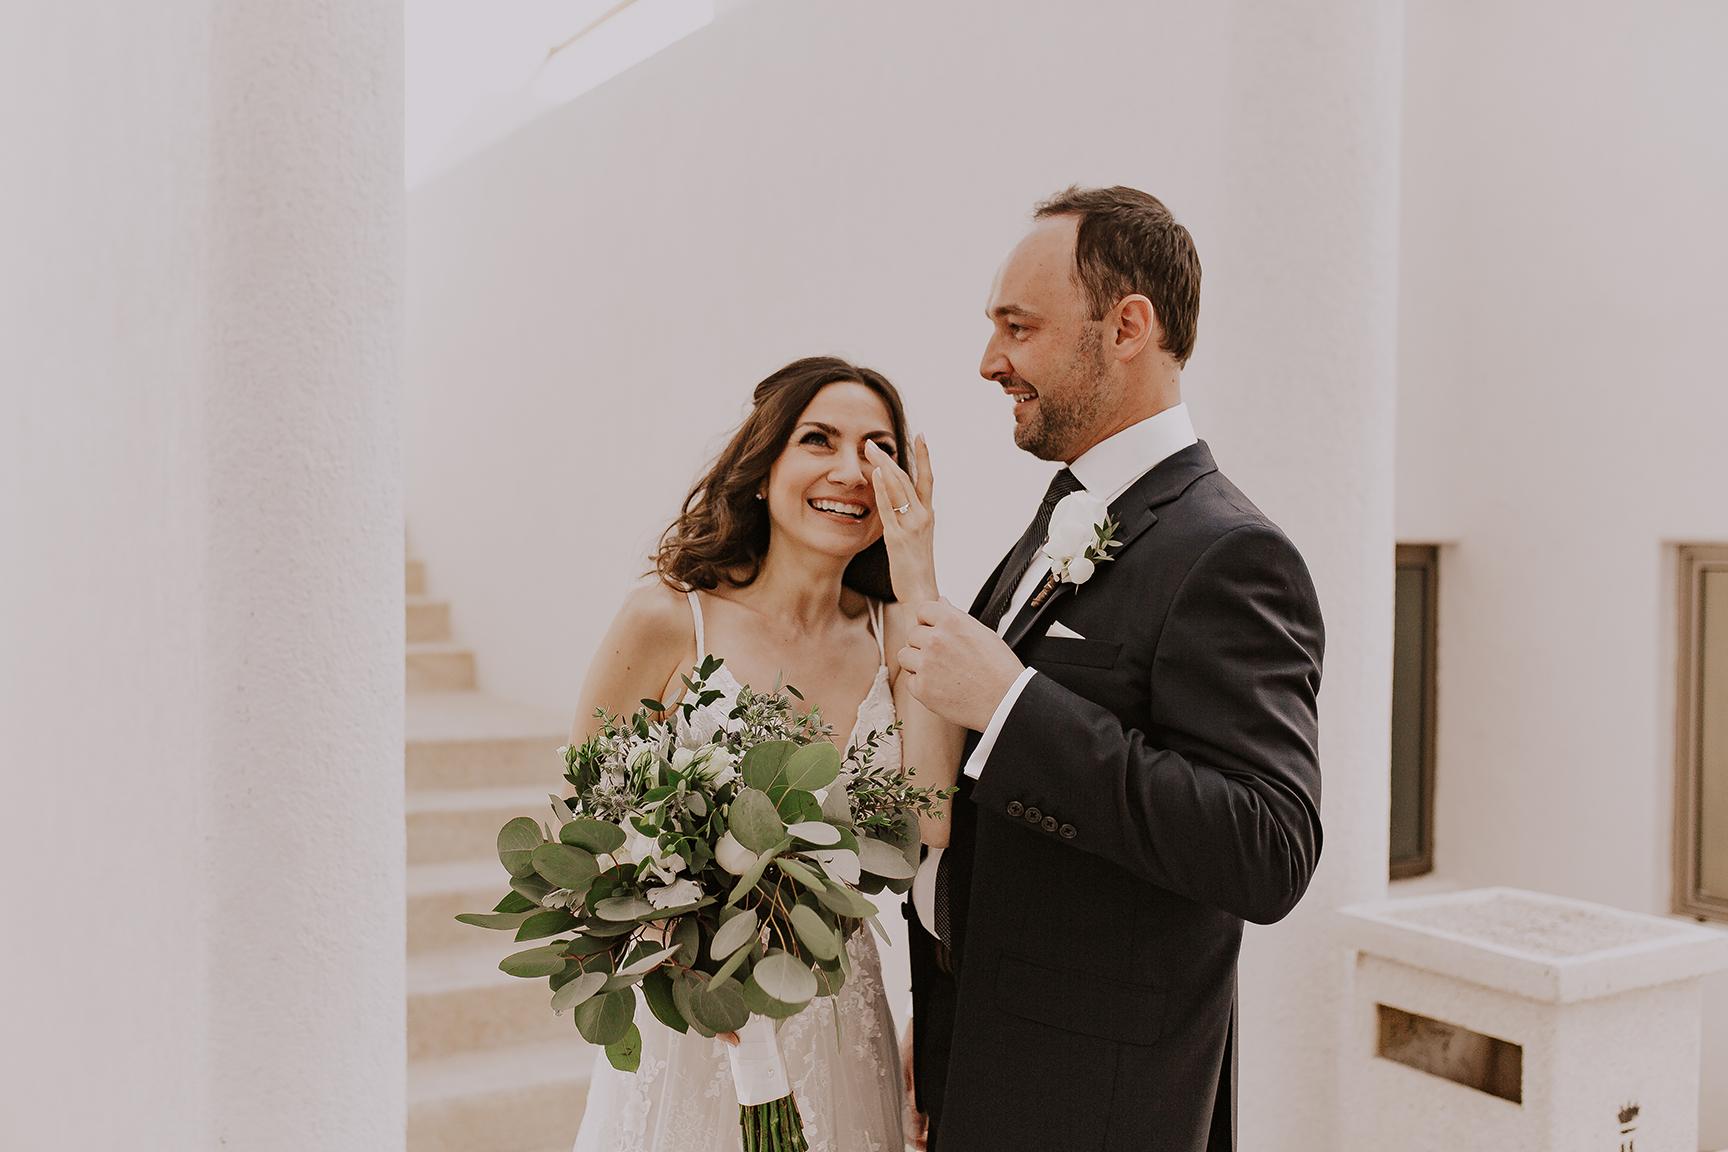 Lindsei+James_cabo_wedding_213.jpg